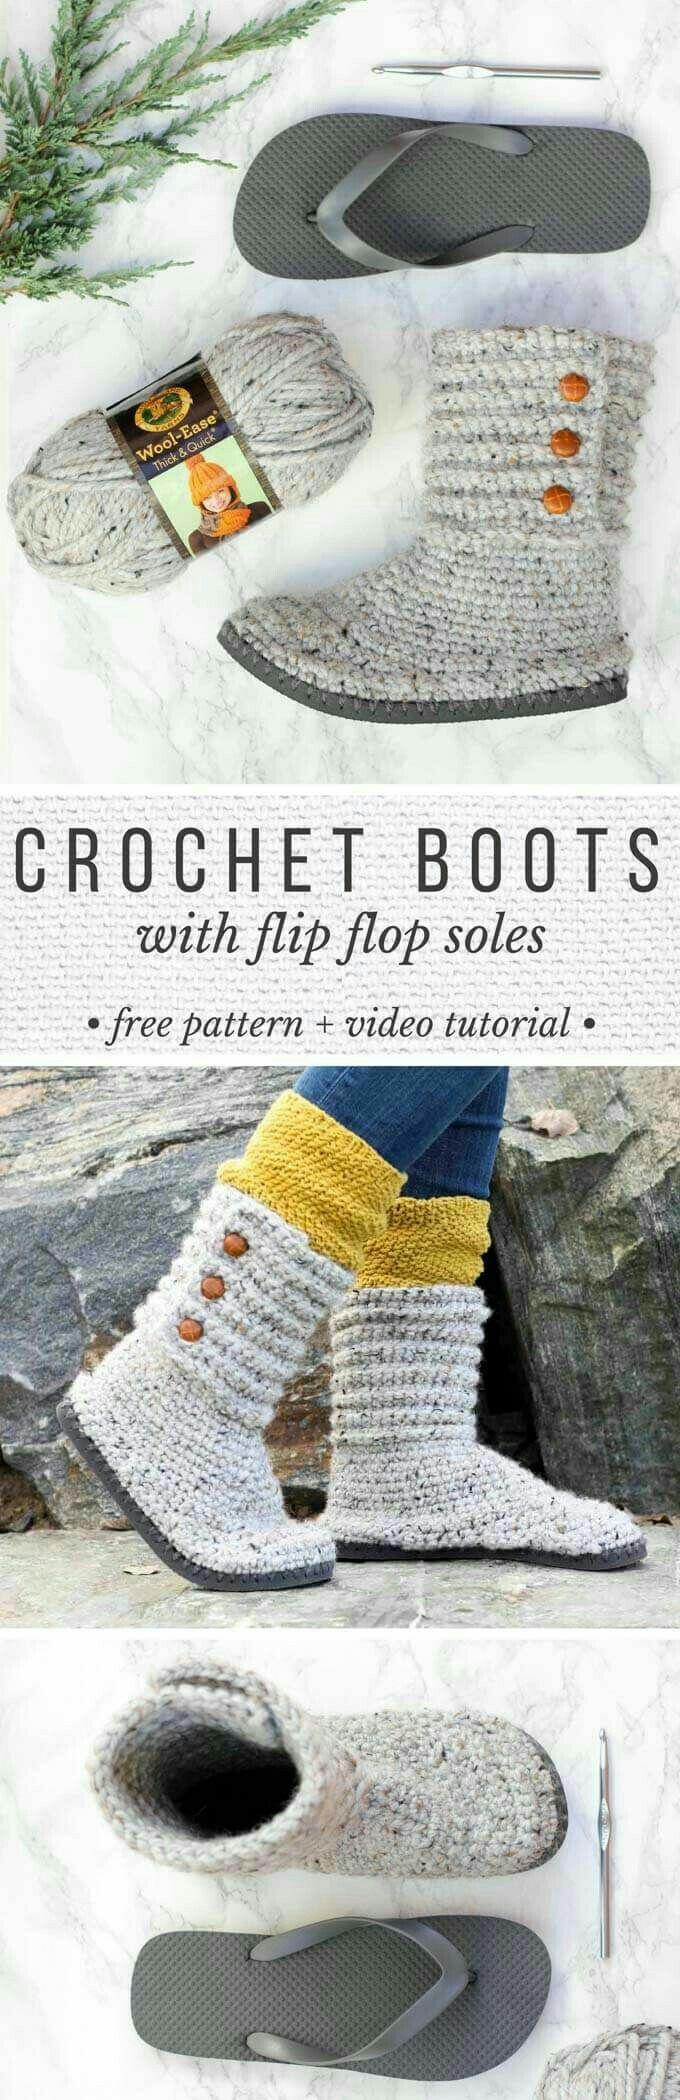 Mejores 39 imágenes de Tricot/Crochet en Pinterest | Sombreros de ...